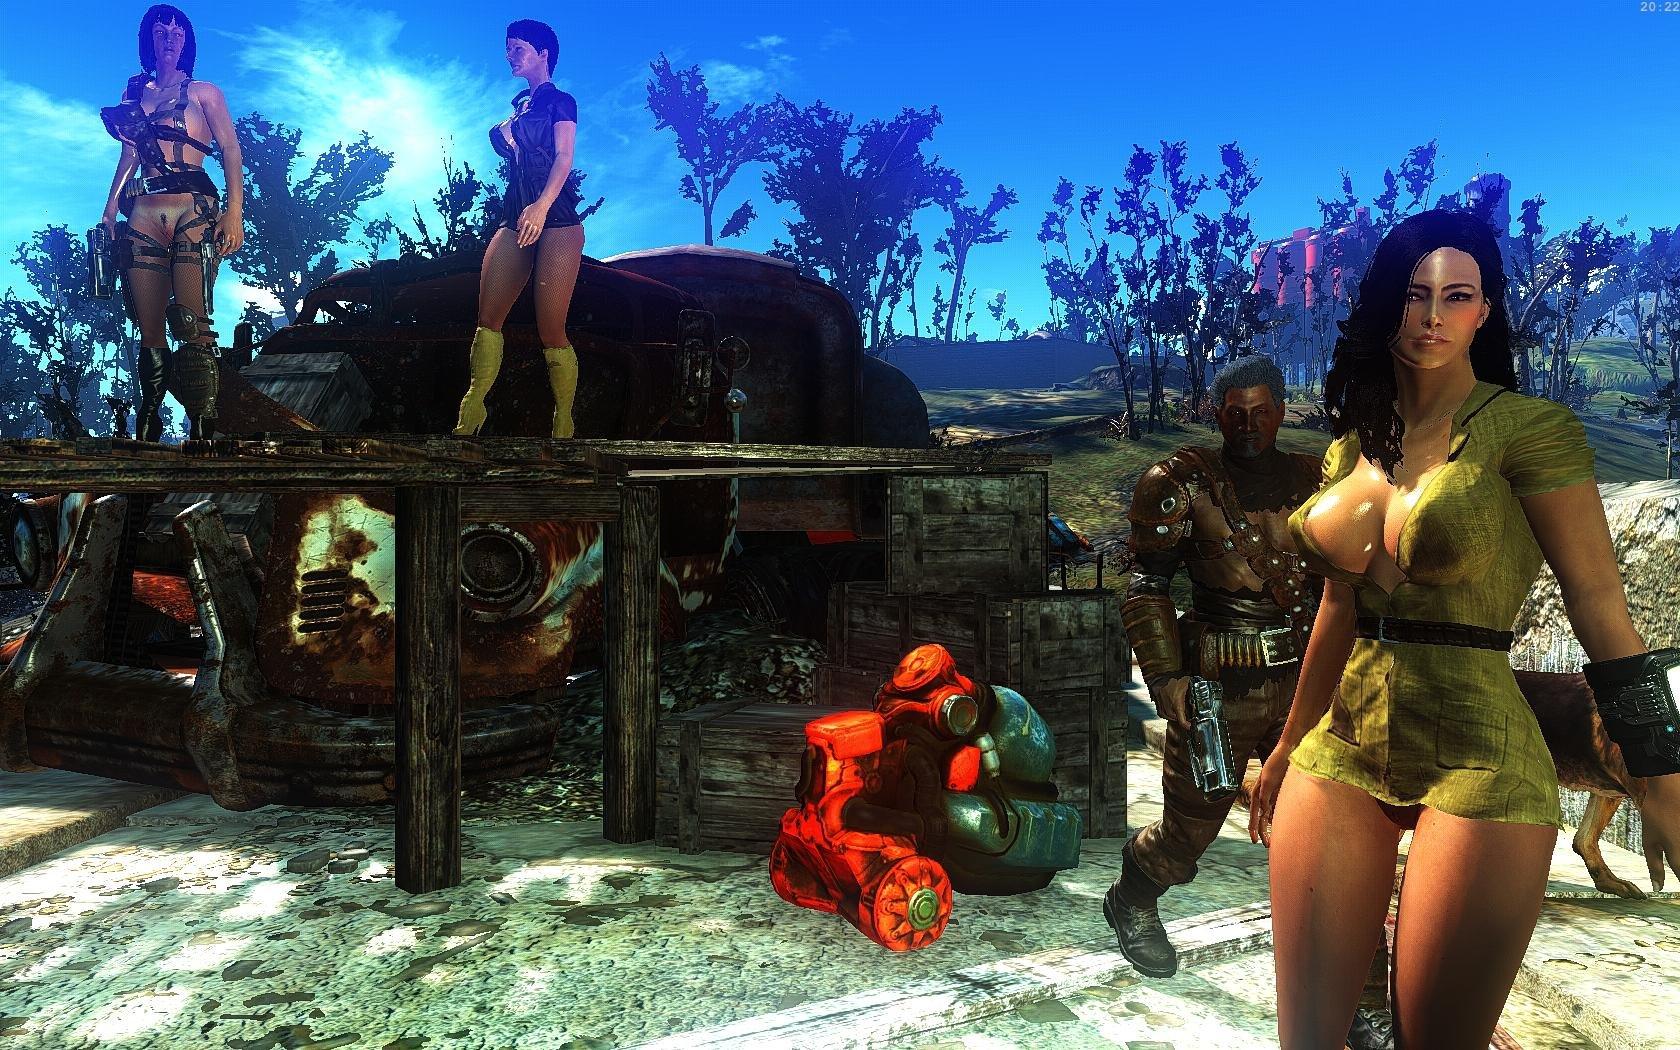 Fallout4 2019-01-21 20-22-15-95